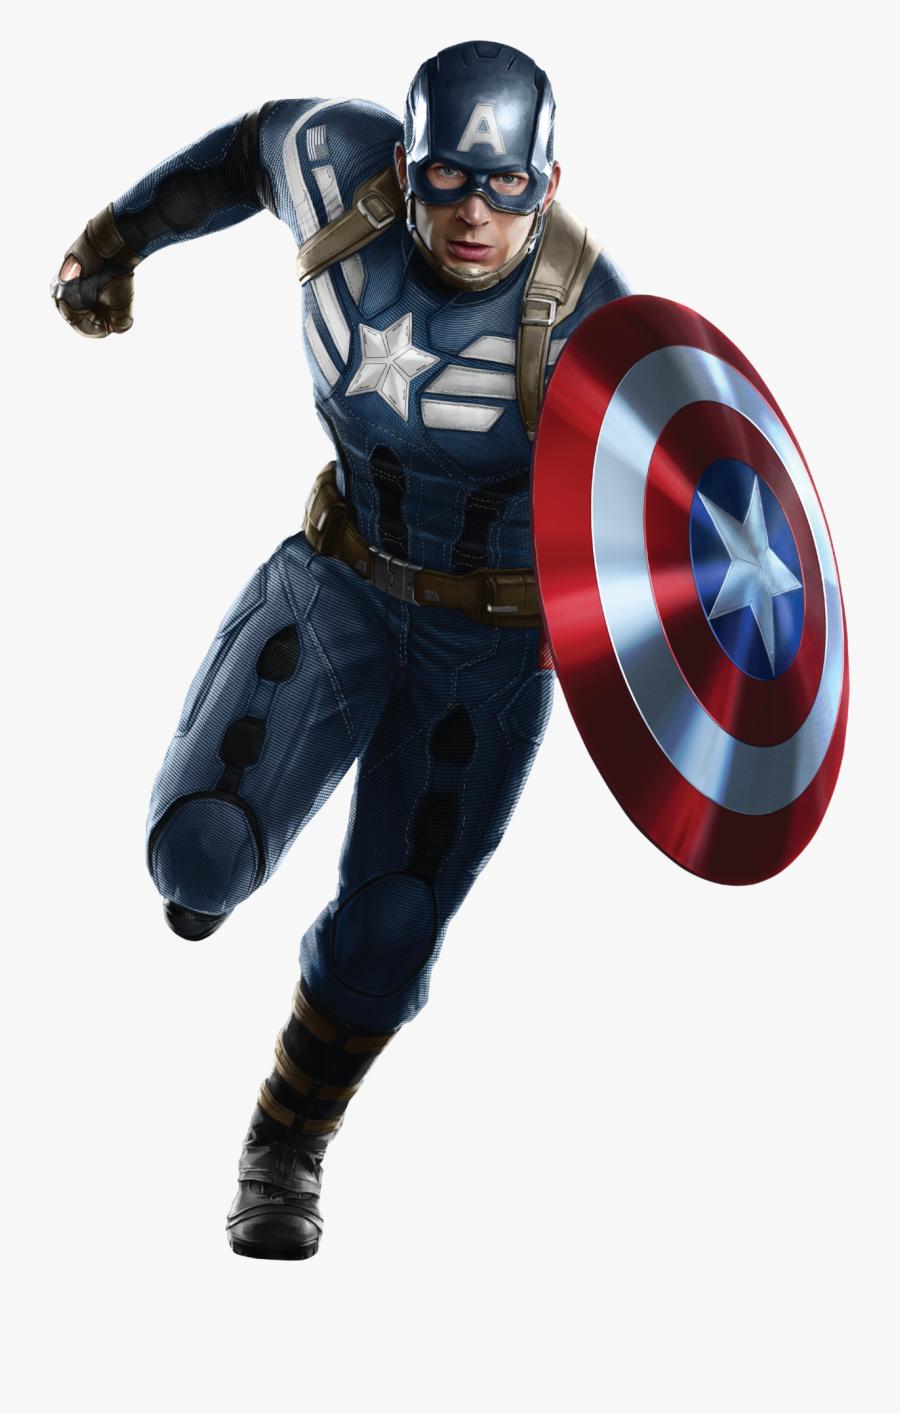 Capitan America Winter Soldier Png, Transparent Clipart